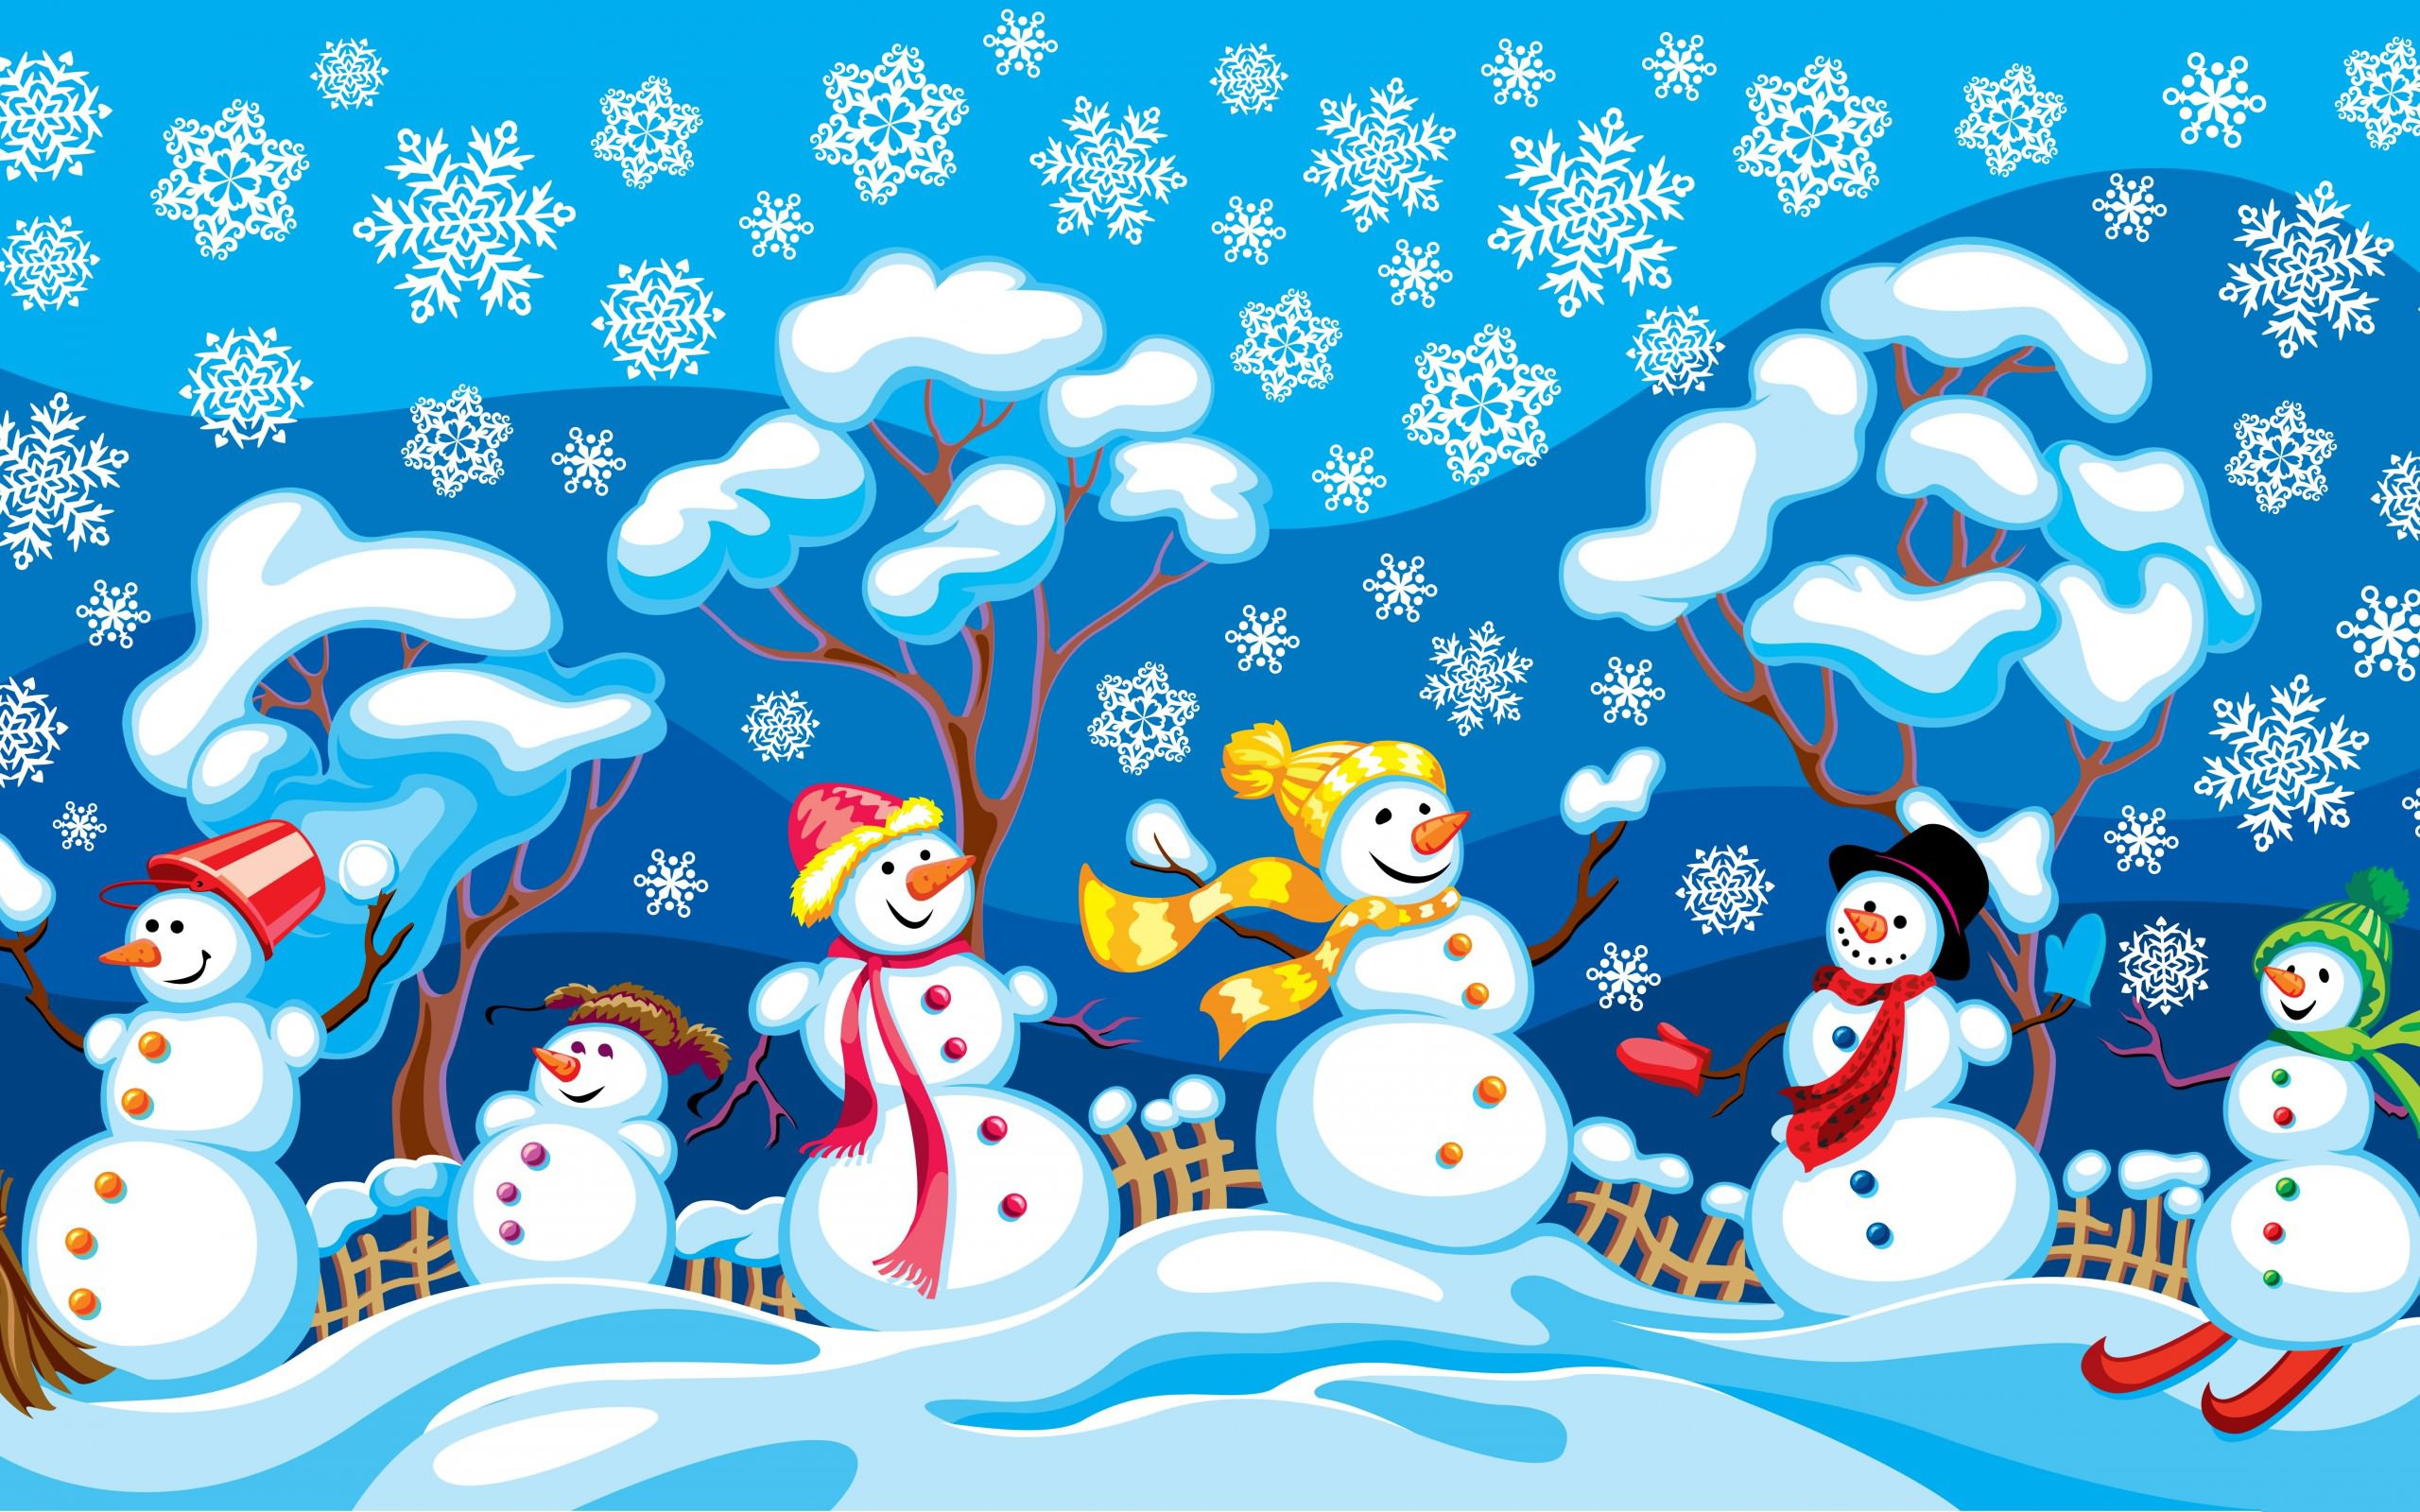 fondos-de-pantalla-de-munecos-de-nieve